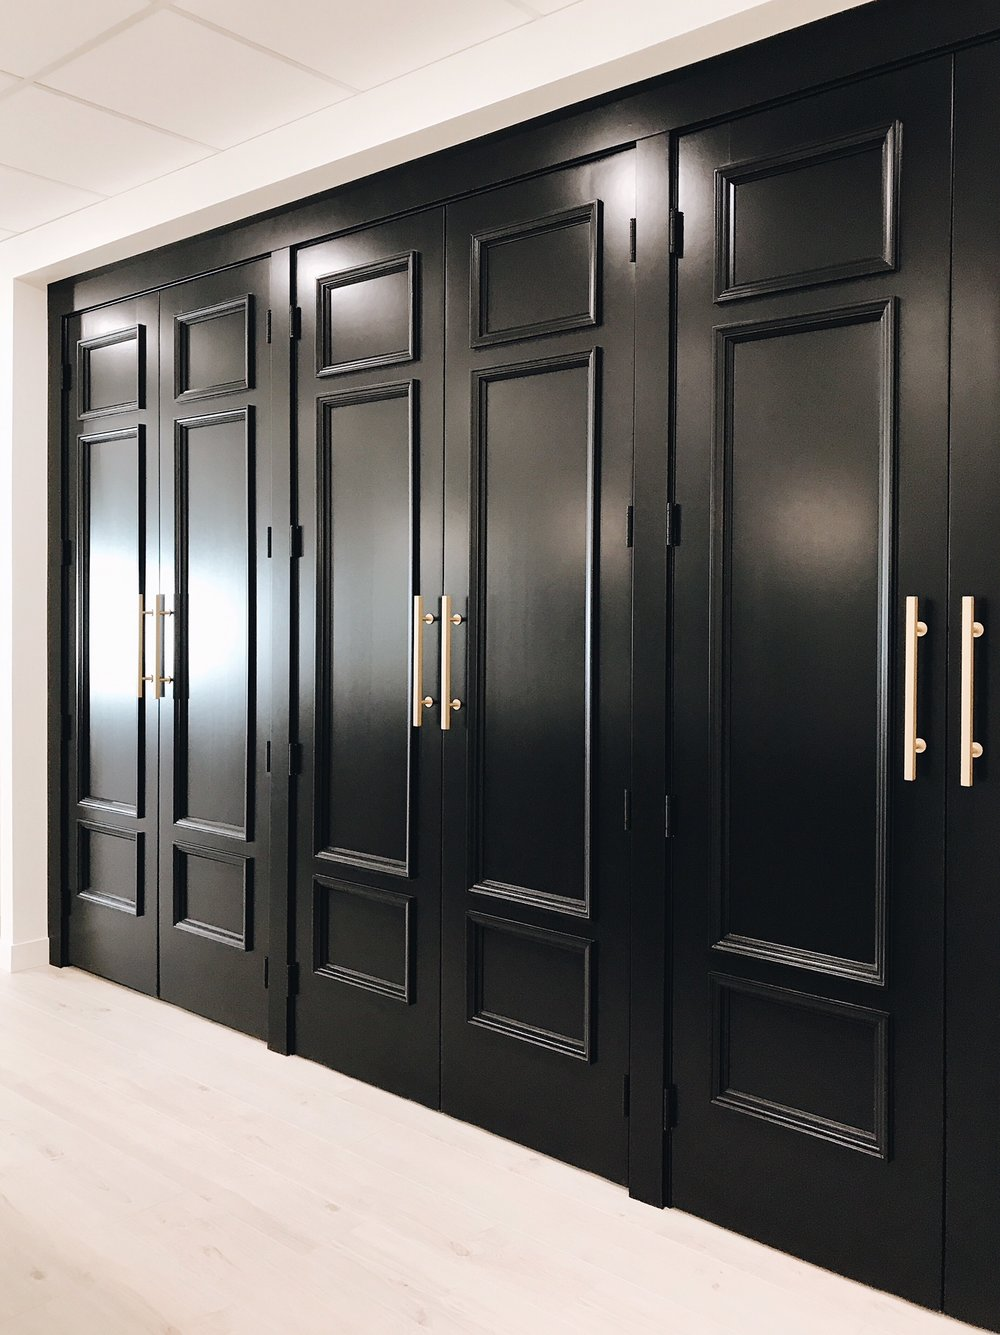 Metrie Doors, Nyla Free Designs Inc., BlogTourKBIS2018, Modenus, Design Hounds